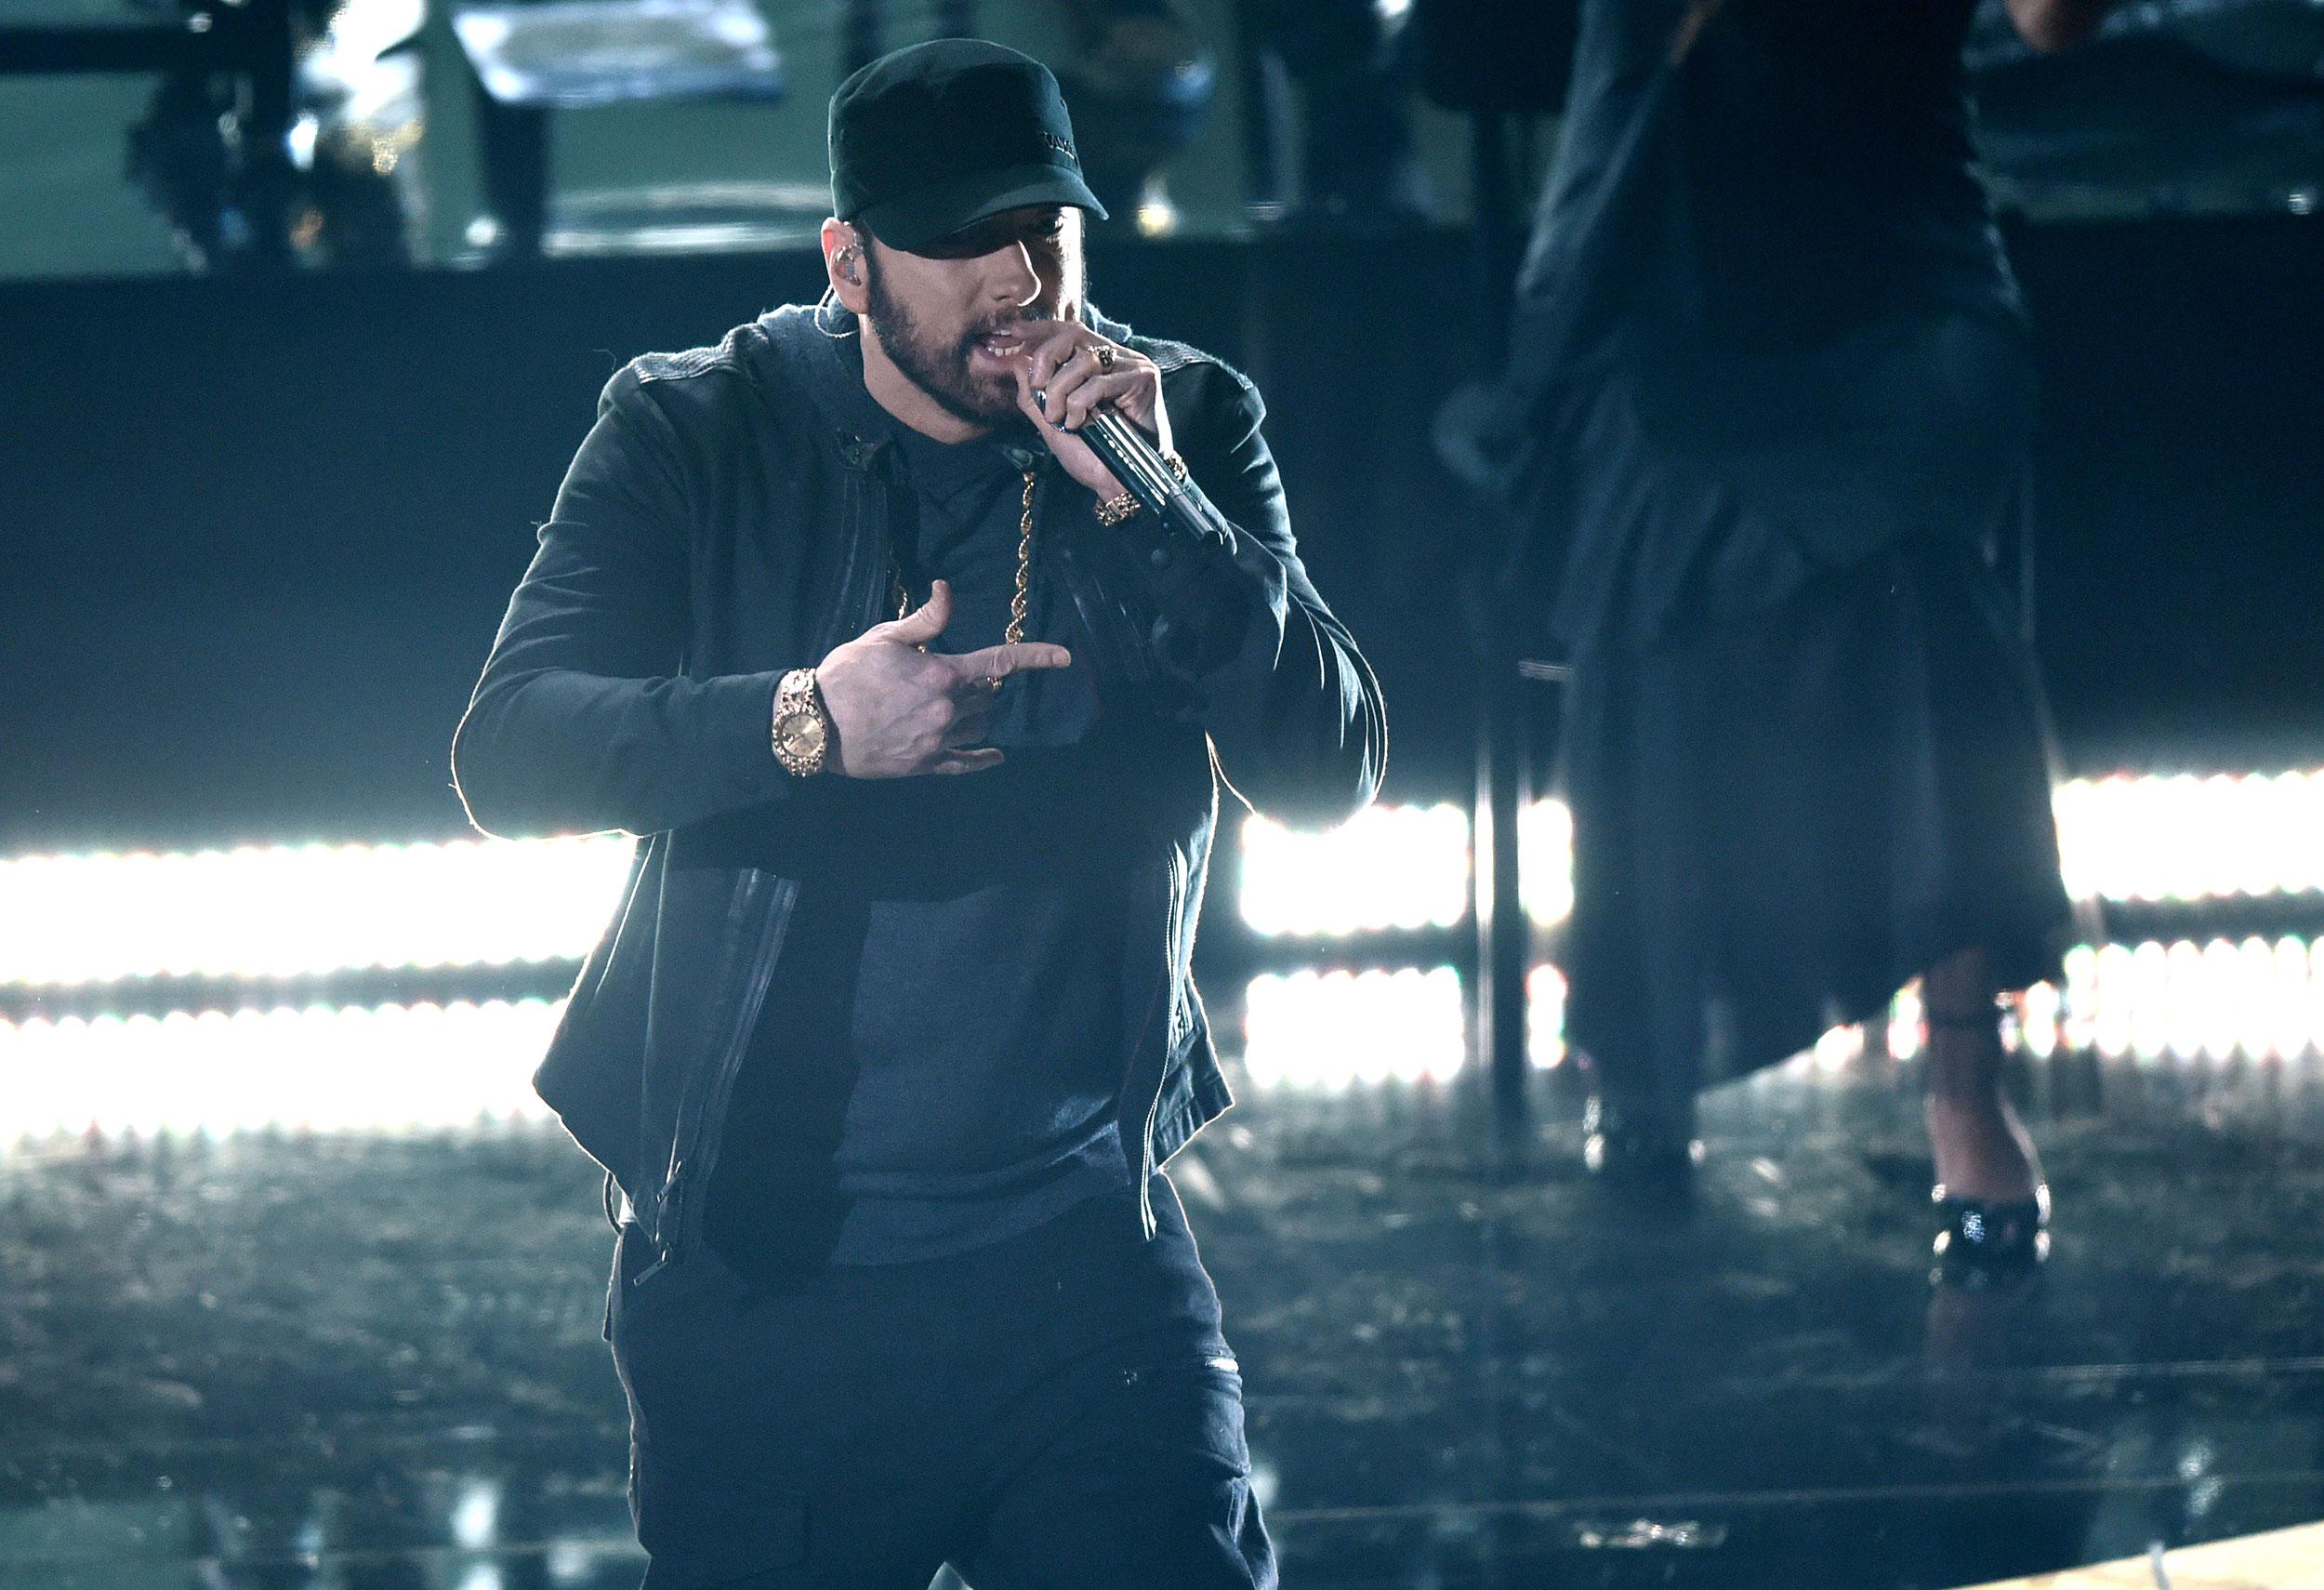 Eminem που εκτελούνται στα Όσκαρ και οι άνθρωποι ήταν μπερδεμένοι